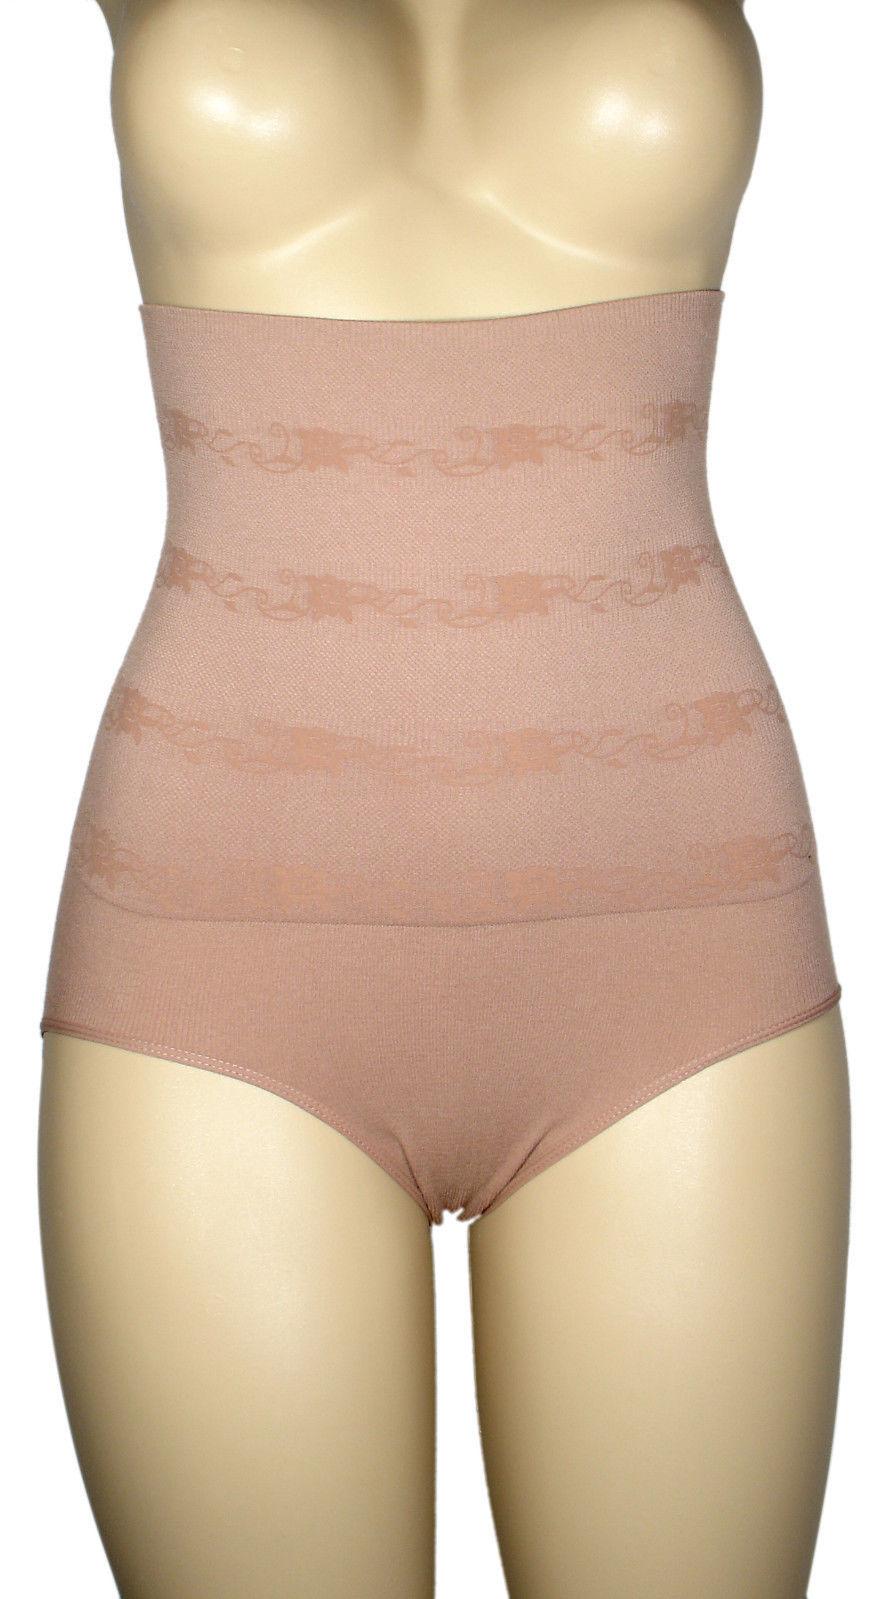 8014b8ee7e New Tummy Control Corset Women Slim High Waist Body Shaper Shapewear  Underwear